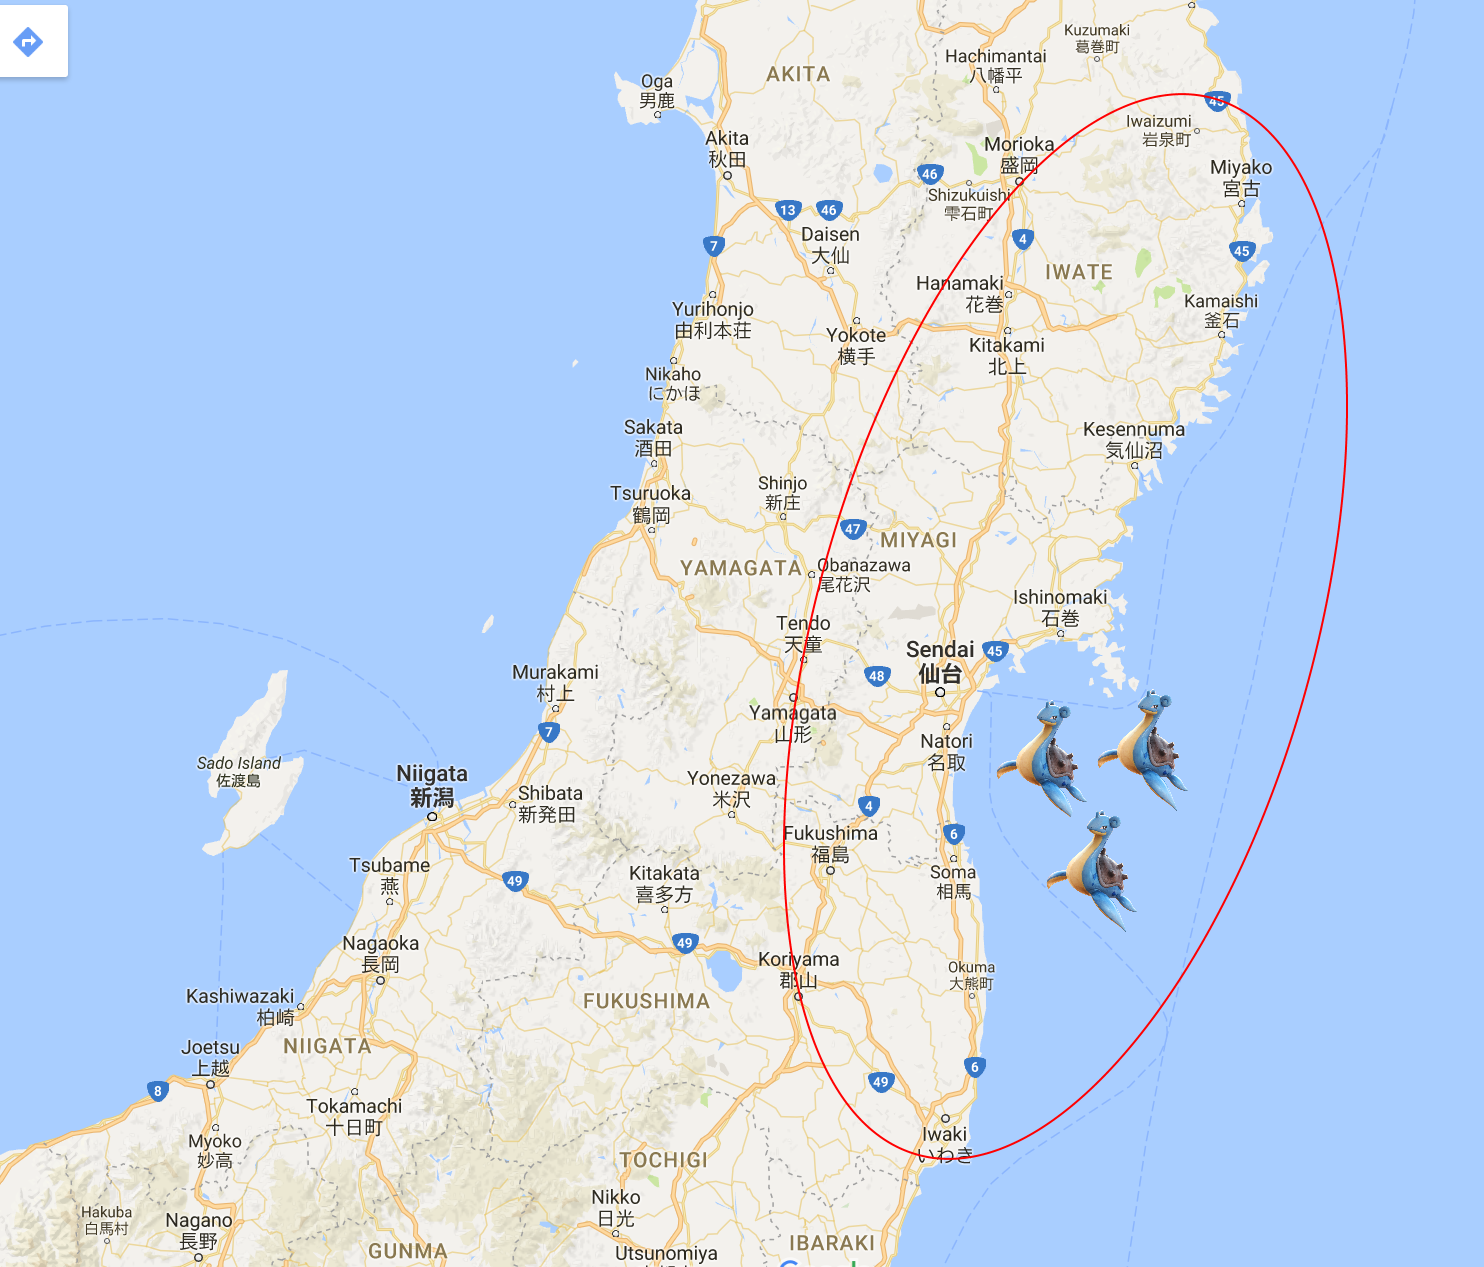 Pokémon GO Lapras Event In Japan Fev Games - Japan map pokemon go